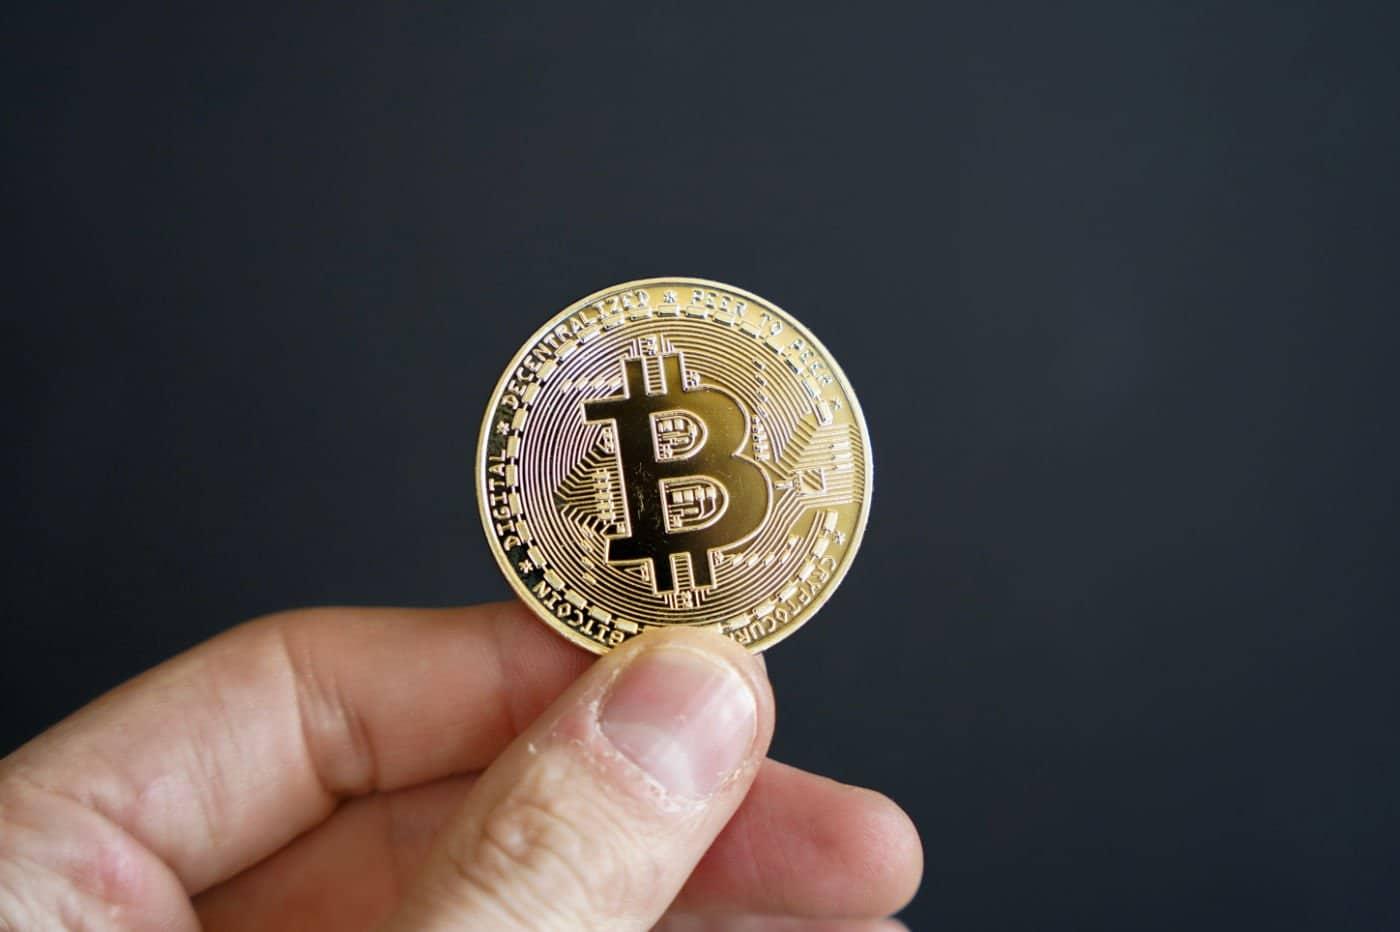 Quelle application pour Bitcoin ?